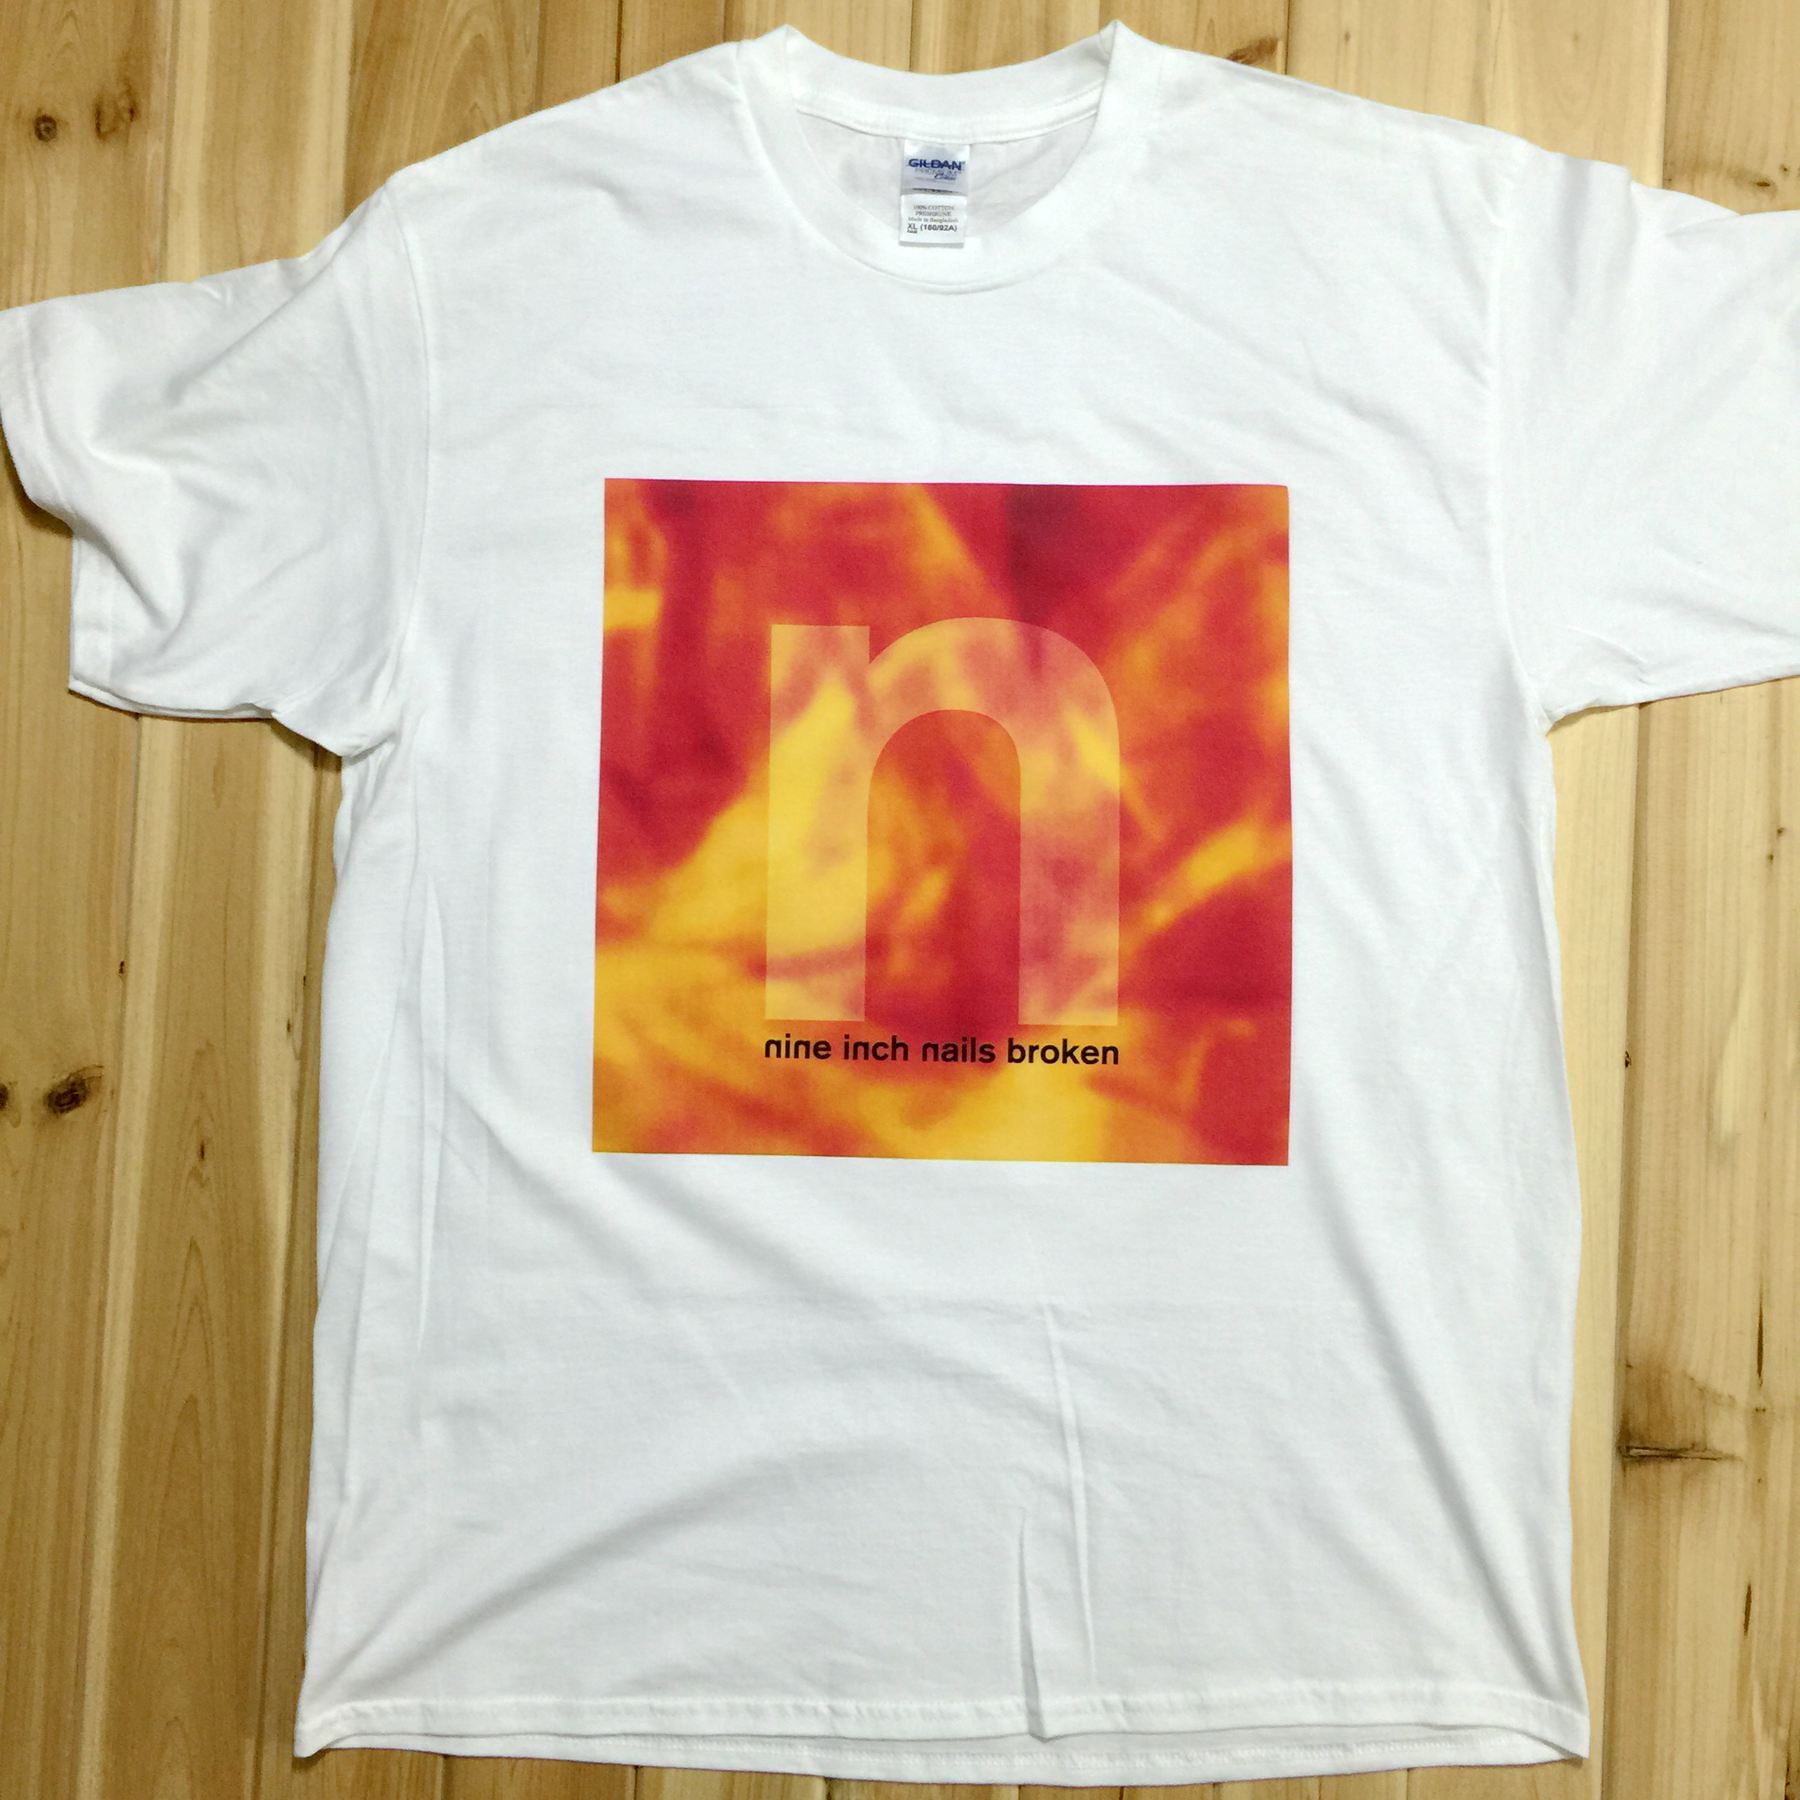 Aliexpress.com : Buy Nine Inch Nails Broken Rock Music Band CD T ...